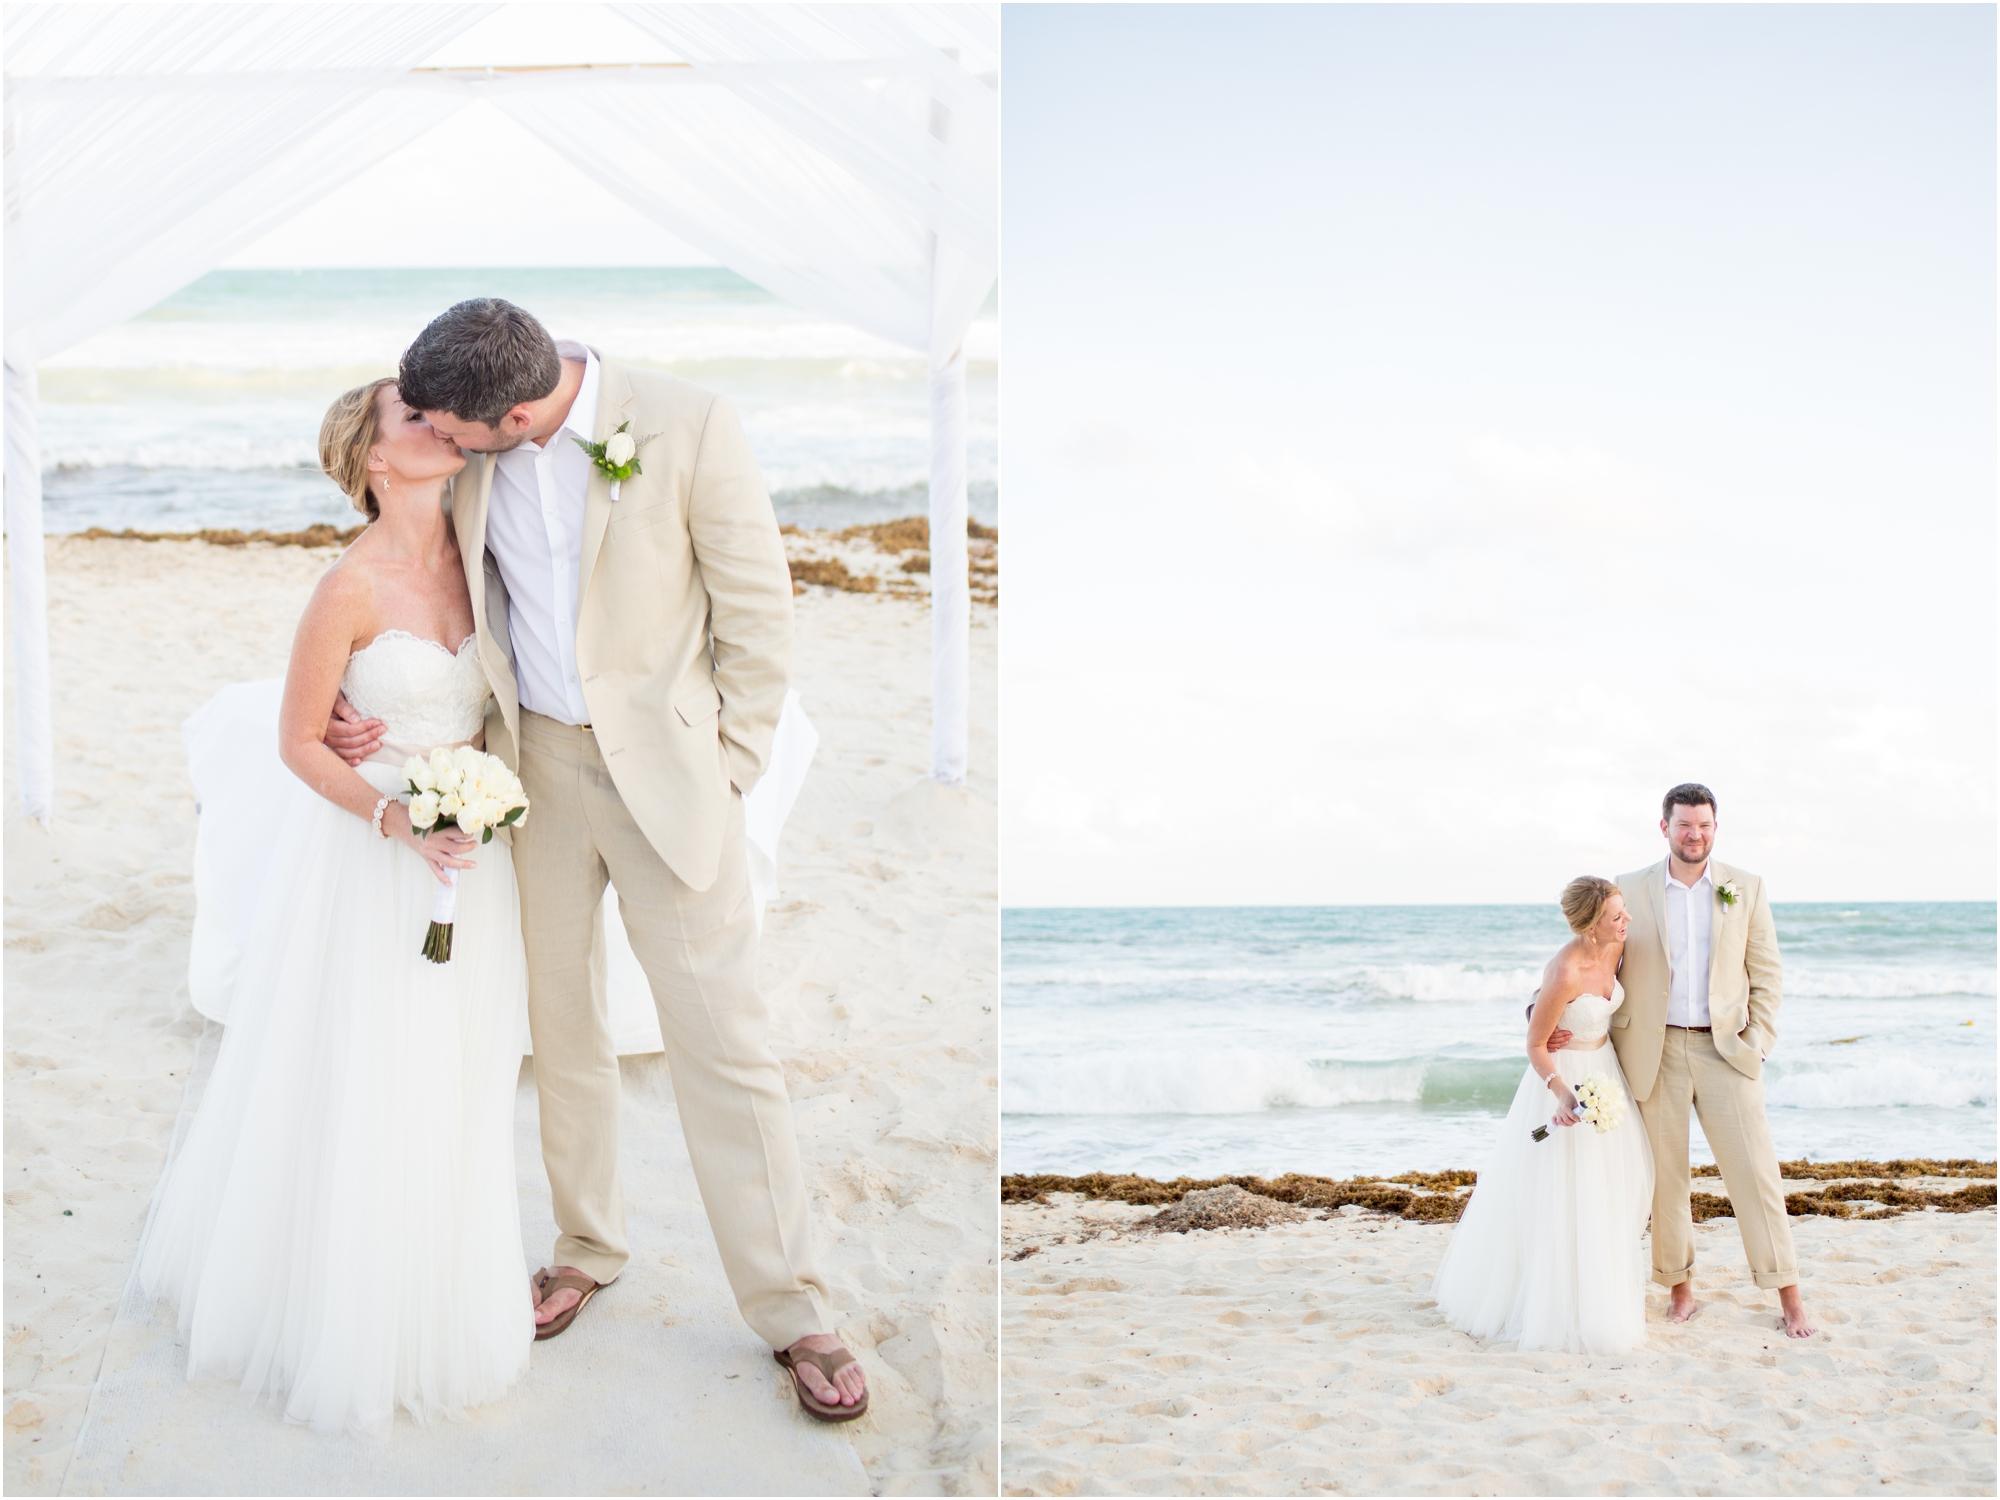 Morosoff Wedding 4-Bride & Groom Portraits-345_anna grace photography destination wedding photographer playa del carmen mexico photo.jpg